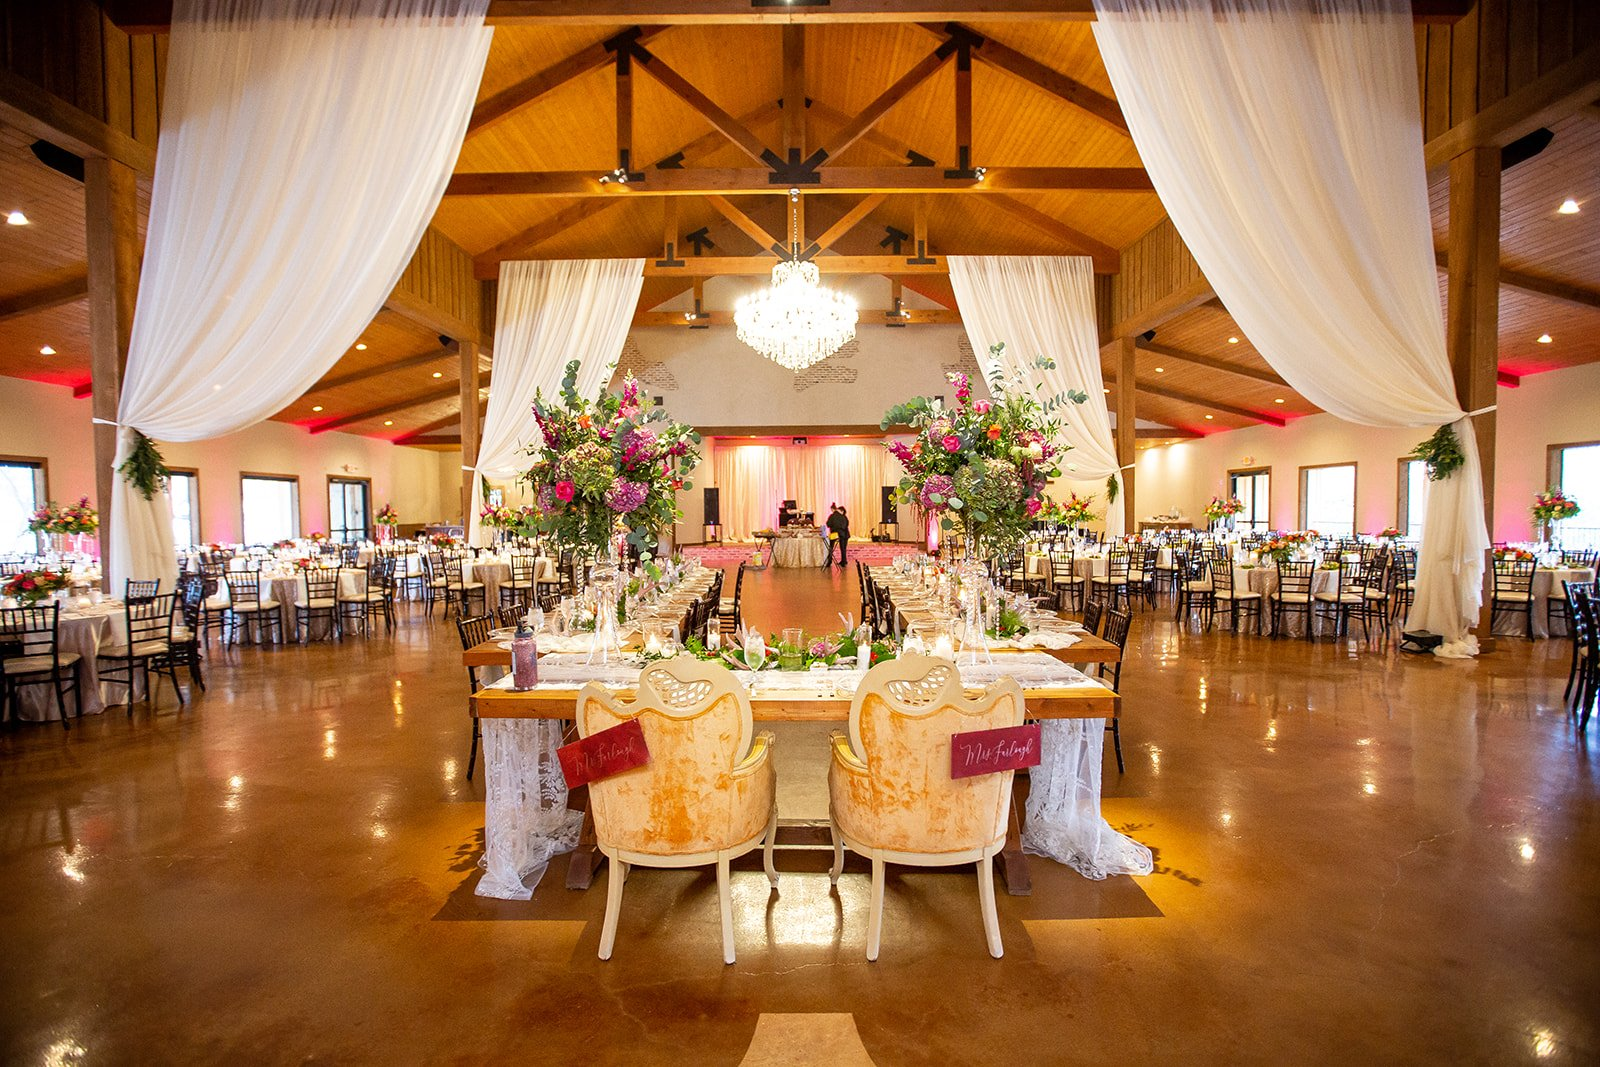 The Chandelier of Gruene banquet space.